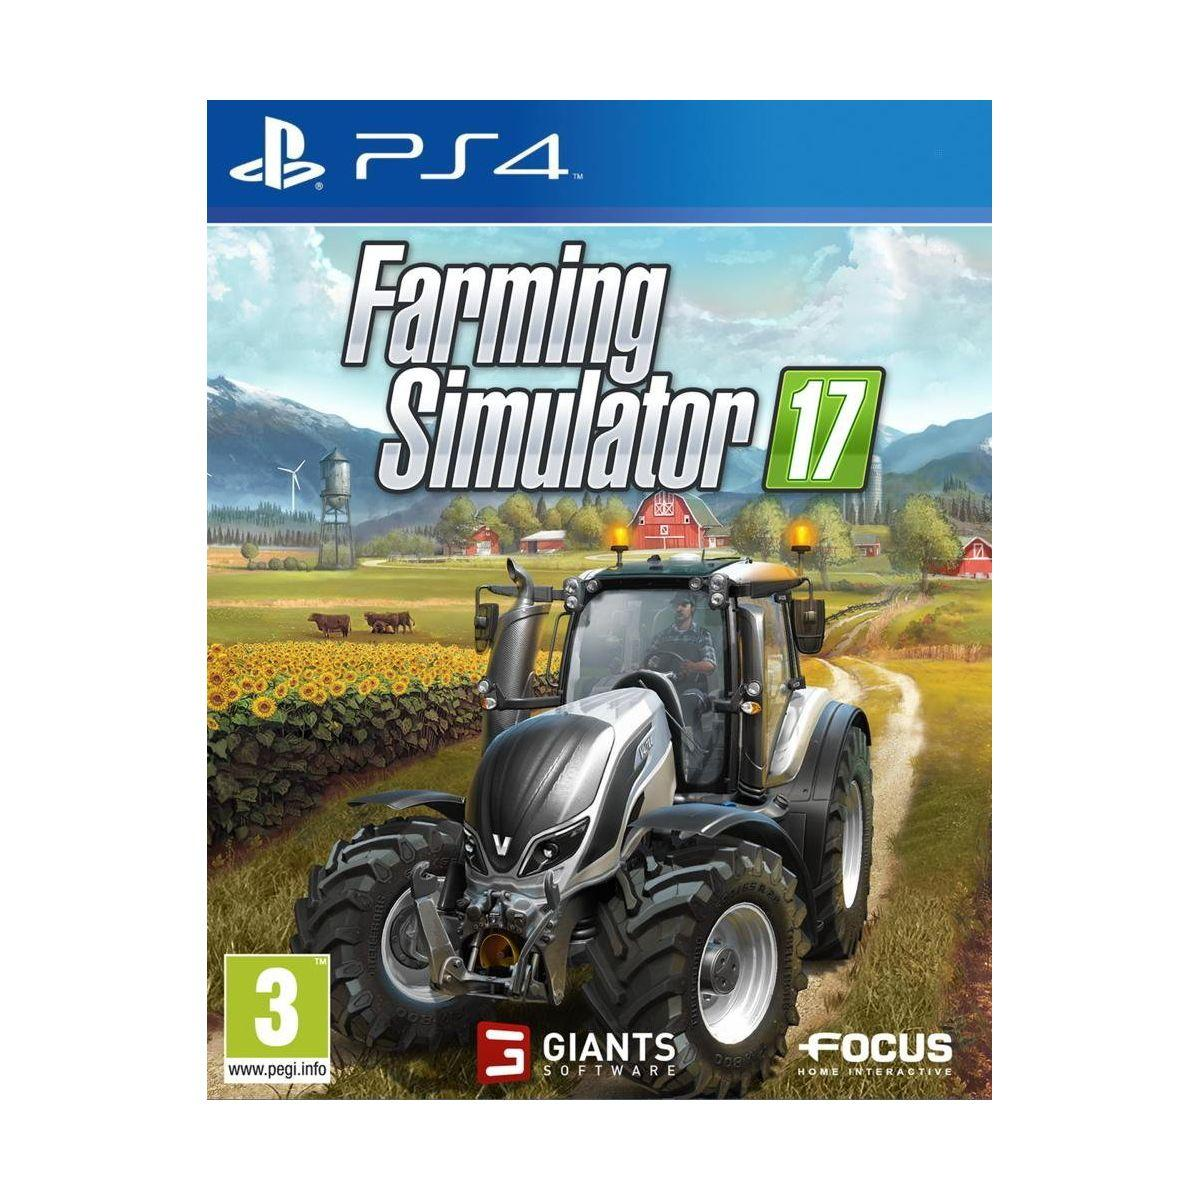 Jeu ps4 focus farming simulator 2017 - 3% de remise immédiate avec le code : multi3 (photo)